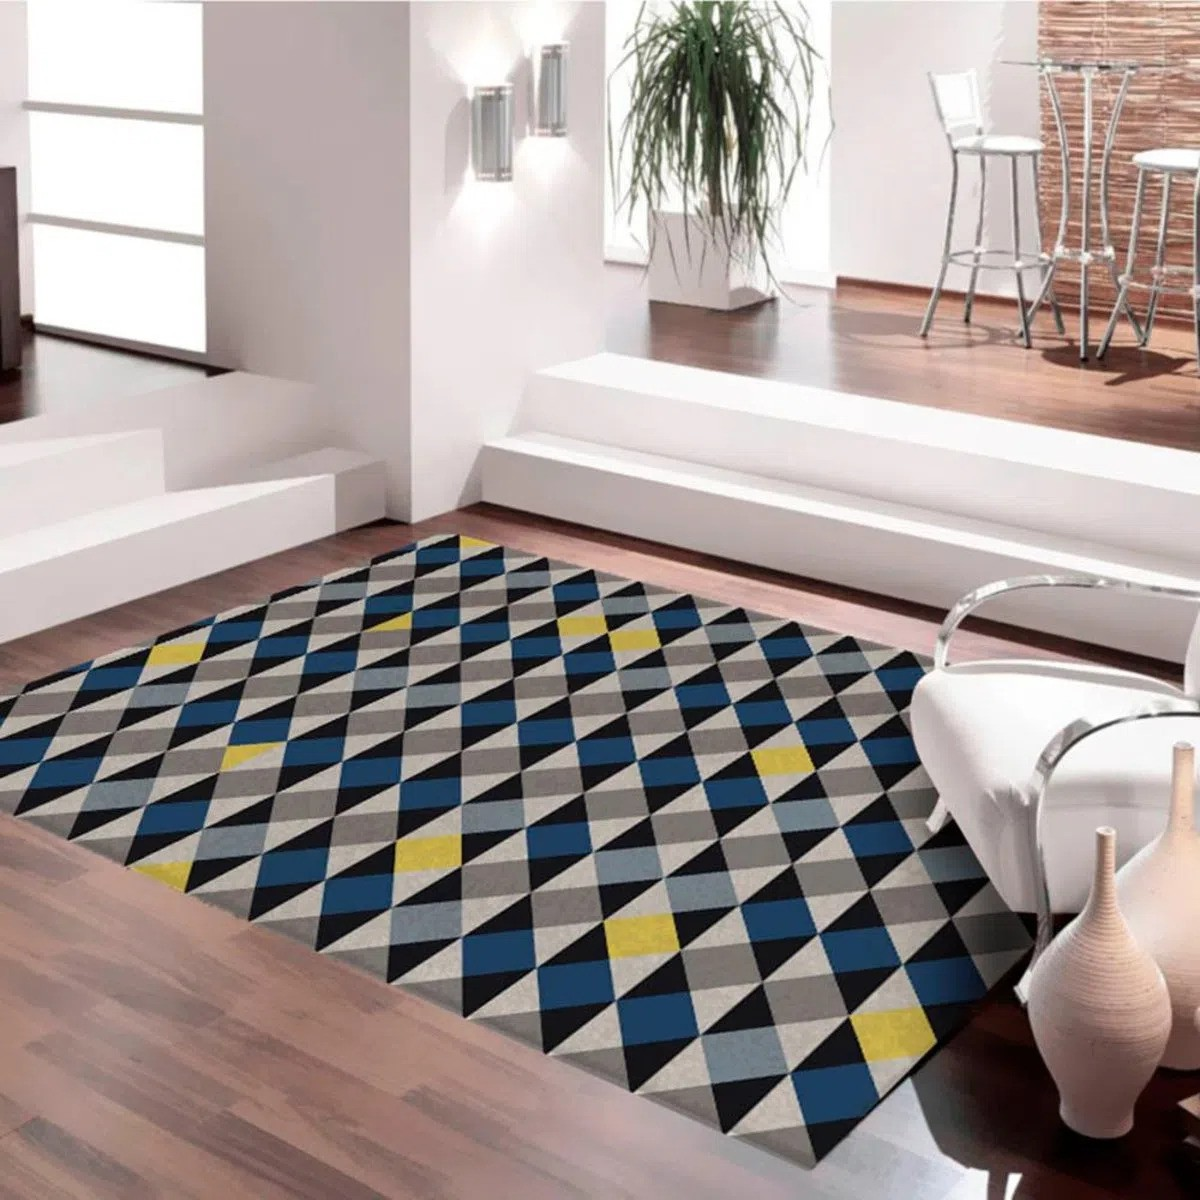 Tapete Antiderrapante Mosaico Casa Moderna 140X200Cm Azul, Amarelo, Bege E Preto Casa Dona